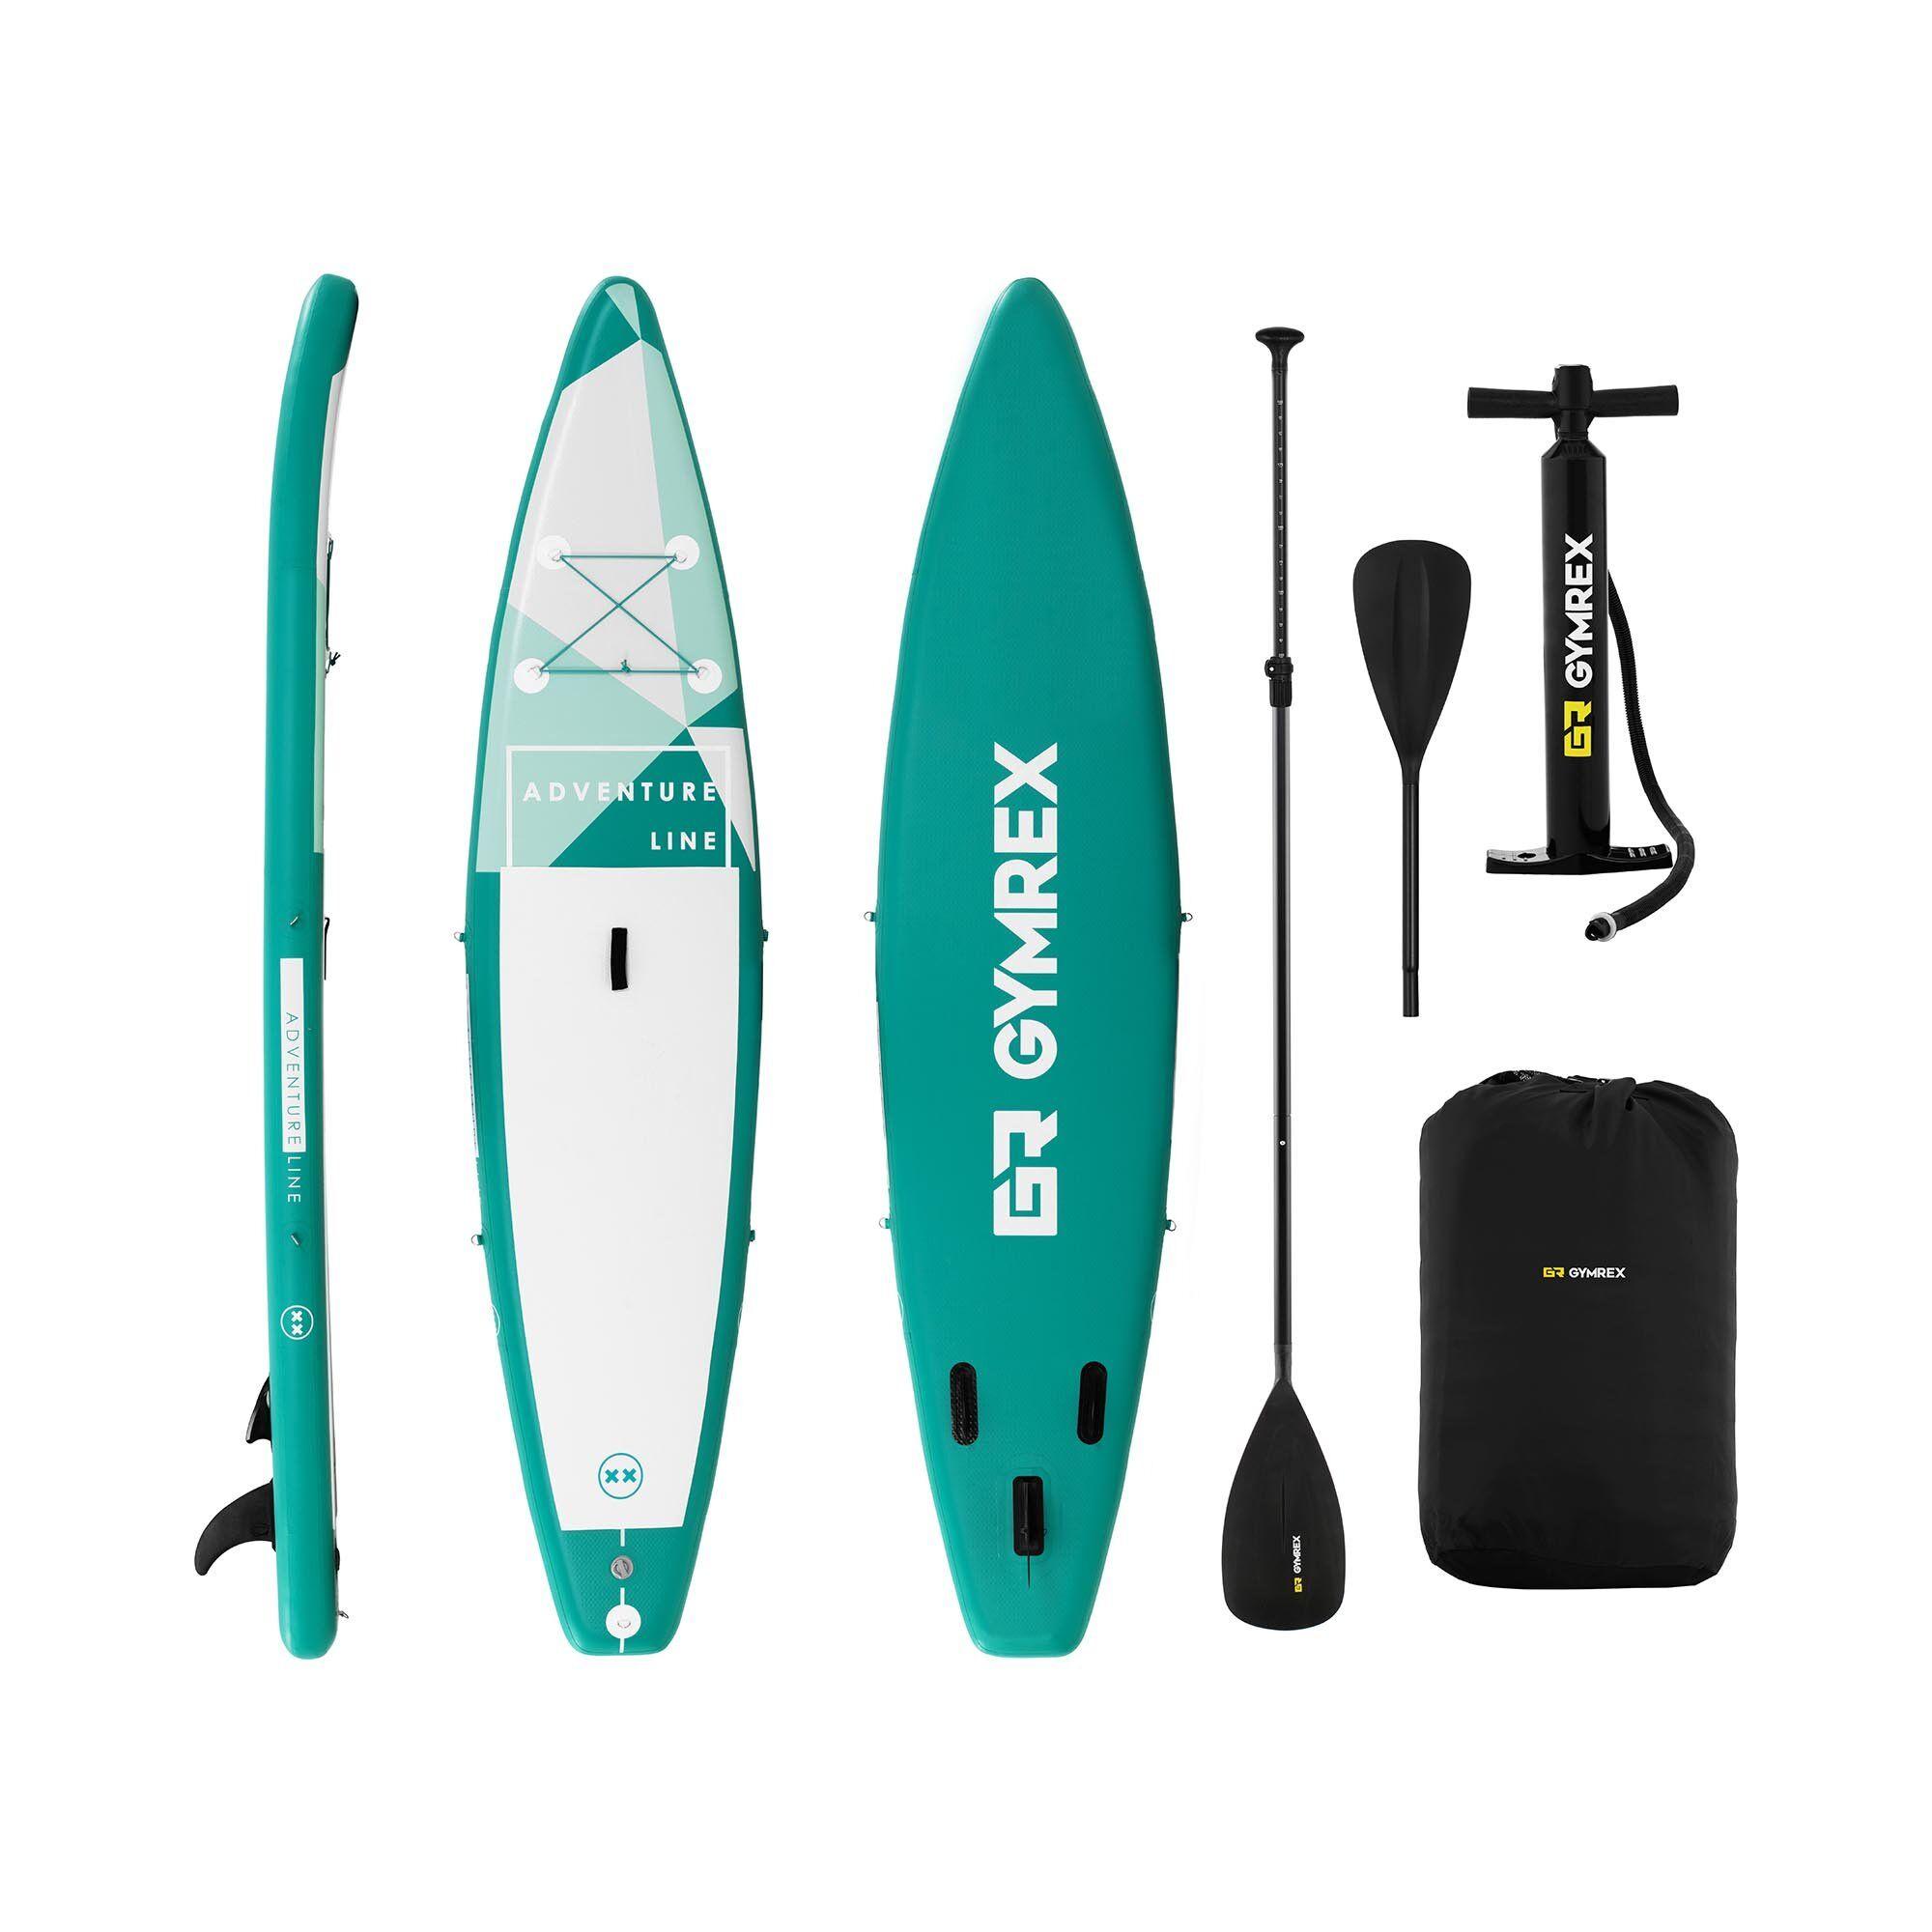 Gymrex Stand up paddle gonflable - 120 kg - Vert - Kit incluant pagaie et accessoires GR-SPB370